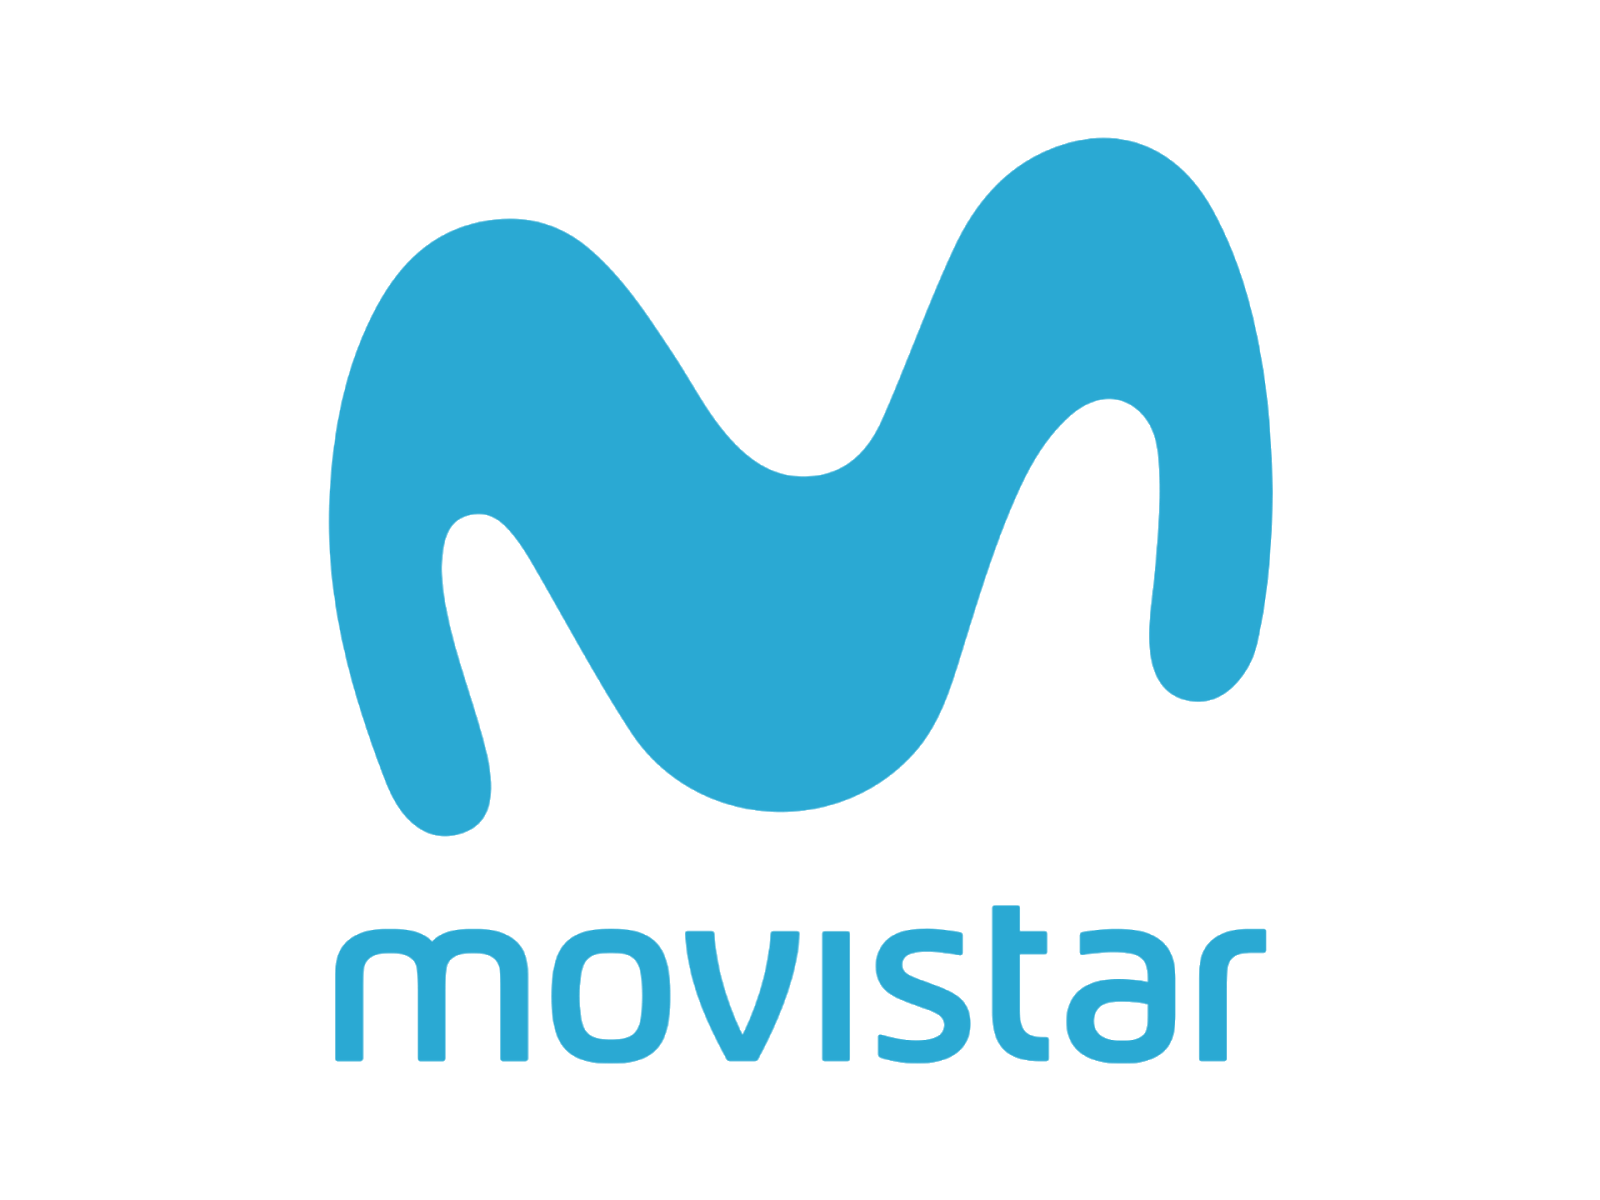 Logo Movistar Format PNG